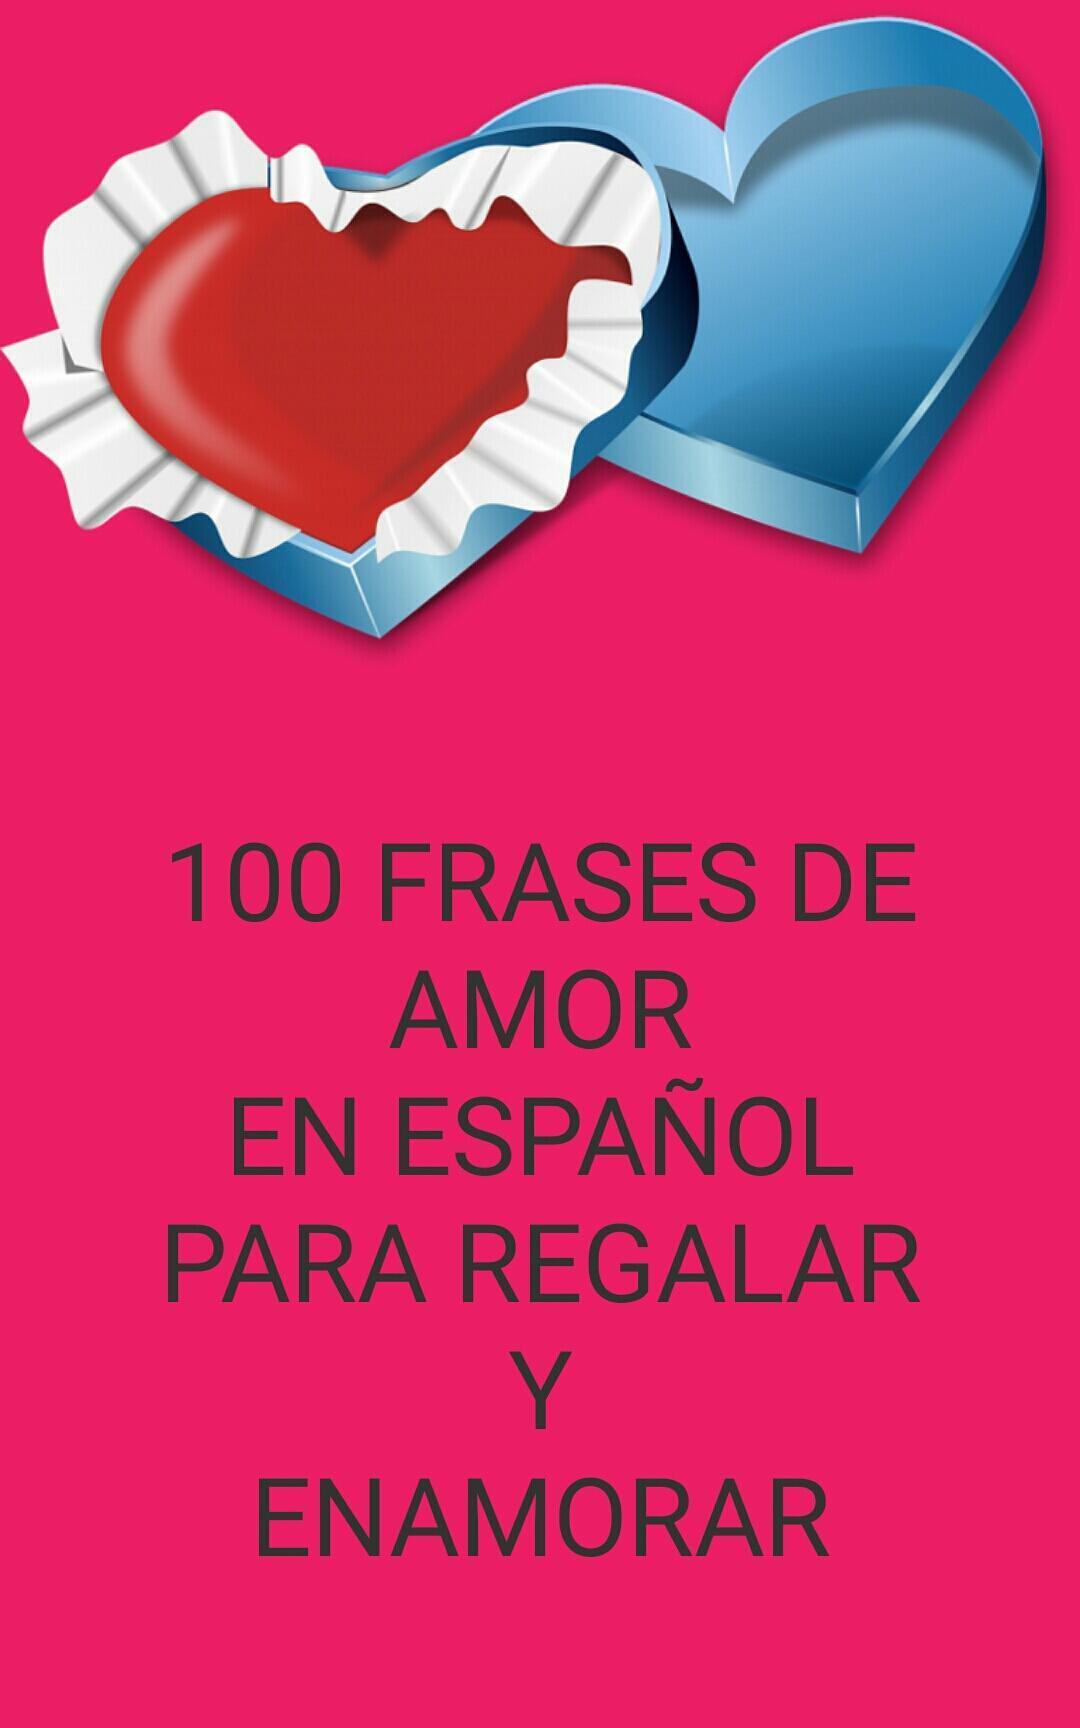 100 Frases De Amor For Android Apk Download